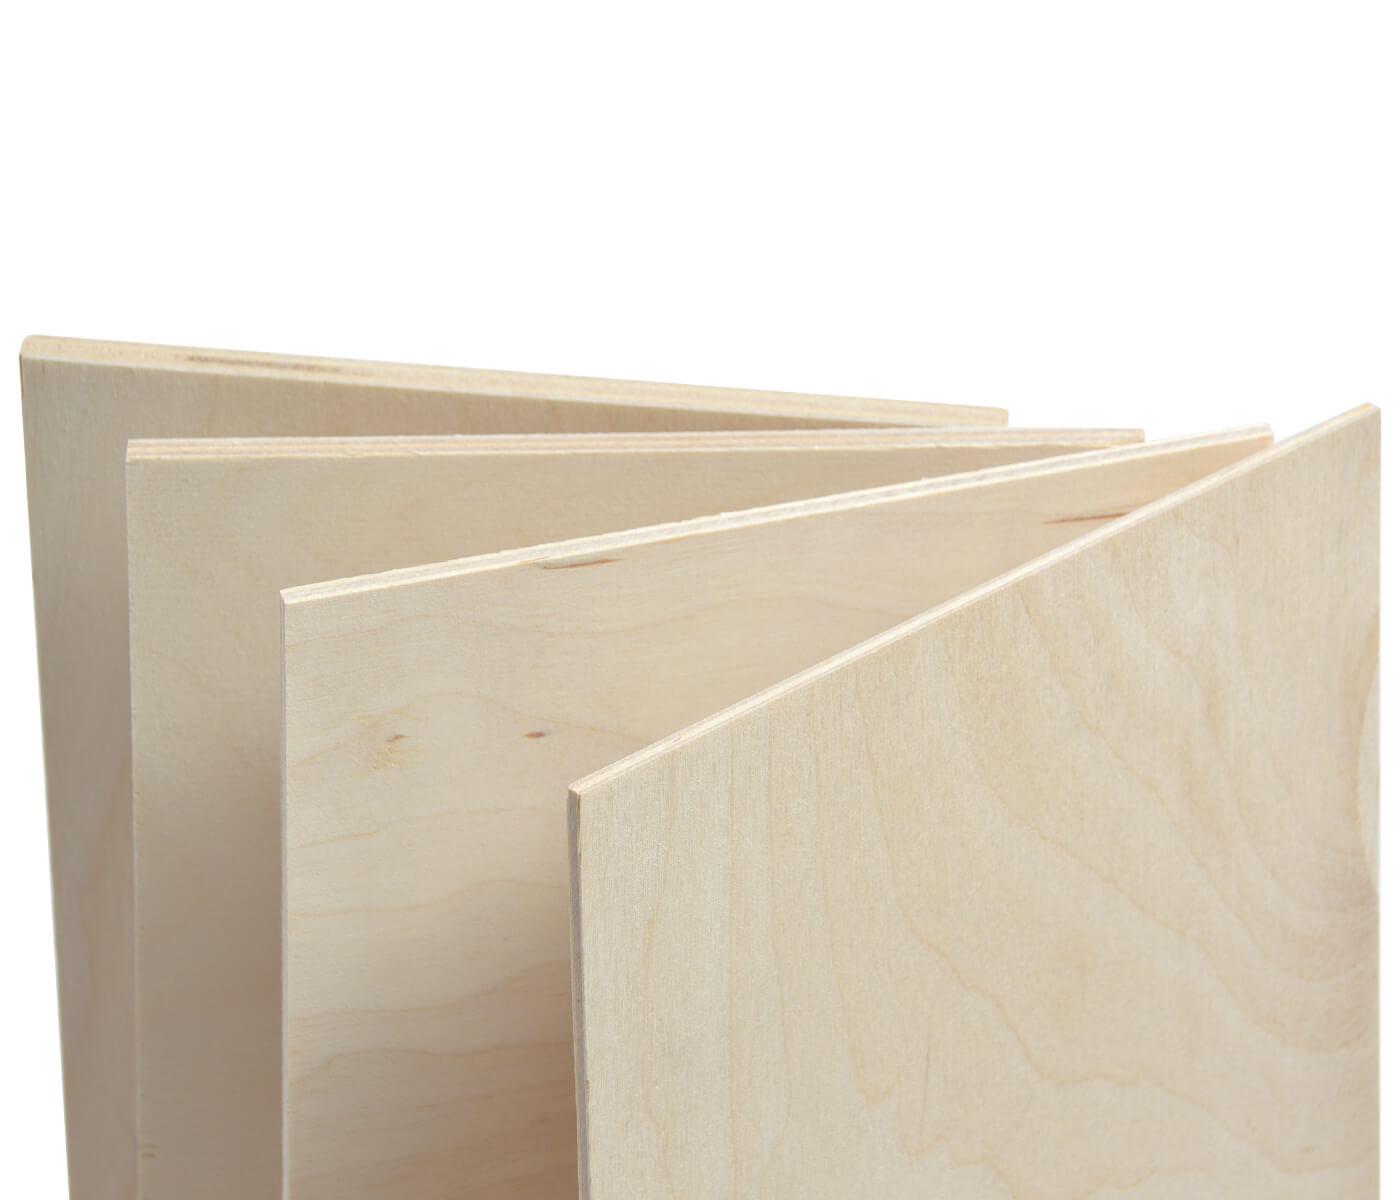 Sperrholz Platten Multiplexplatte Zuschnitt Birke Multiplex Holzplatte 3//4//6mm